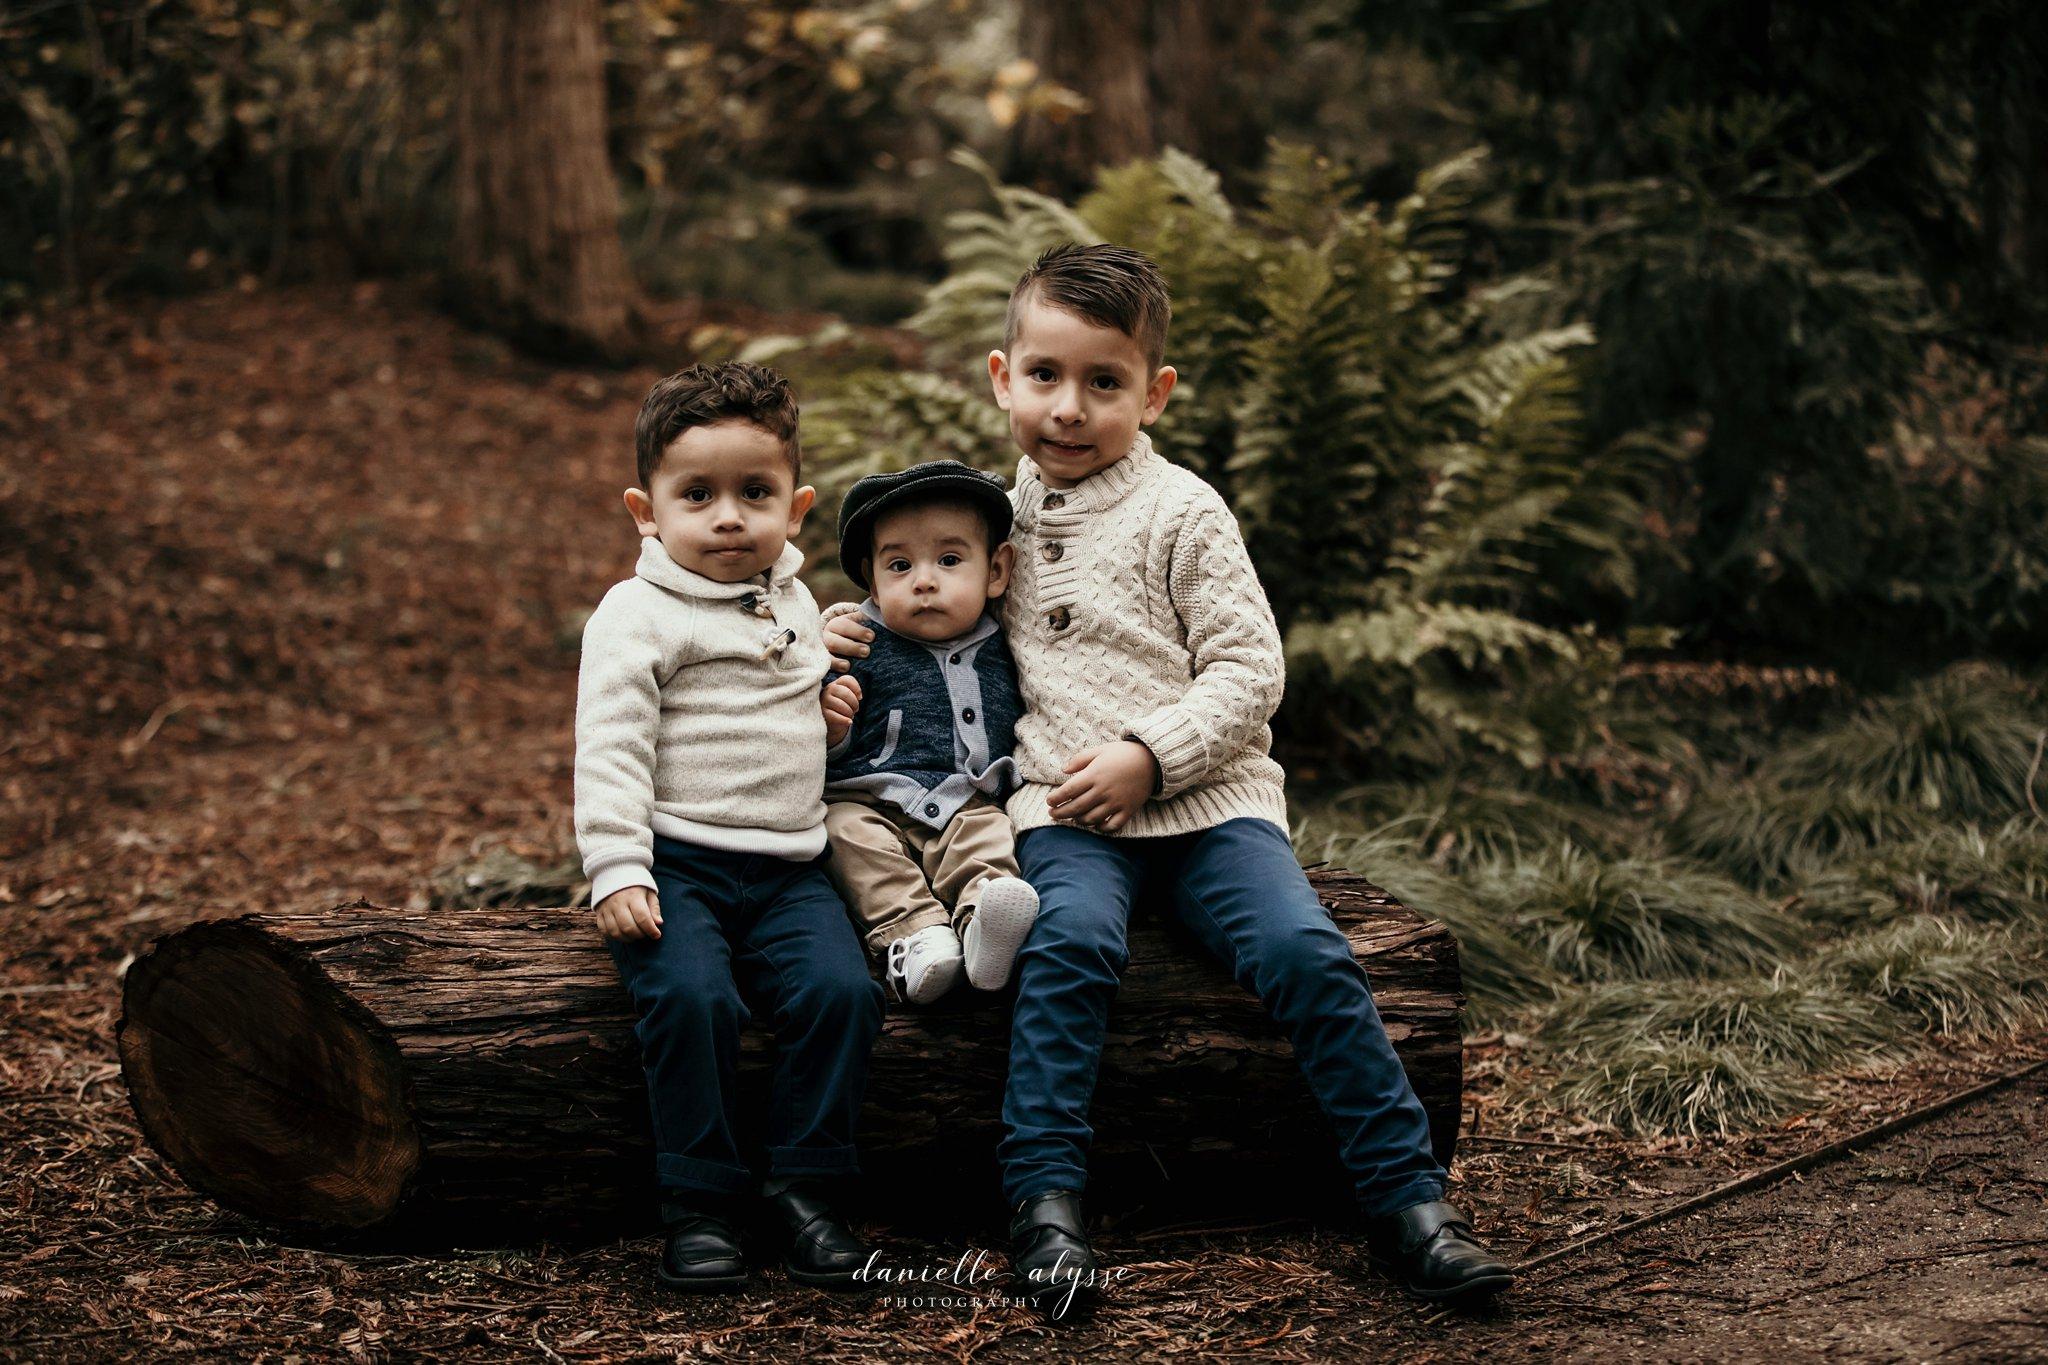 181205_family_portrait_fall_davis_arboretum_andrea_danielle_alysse_photography_11_WEB.jpg